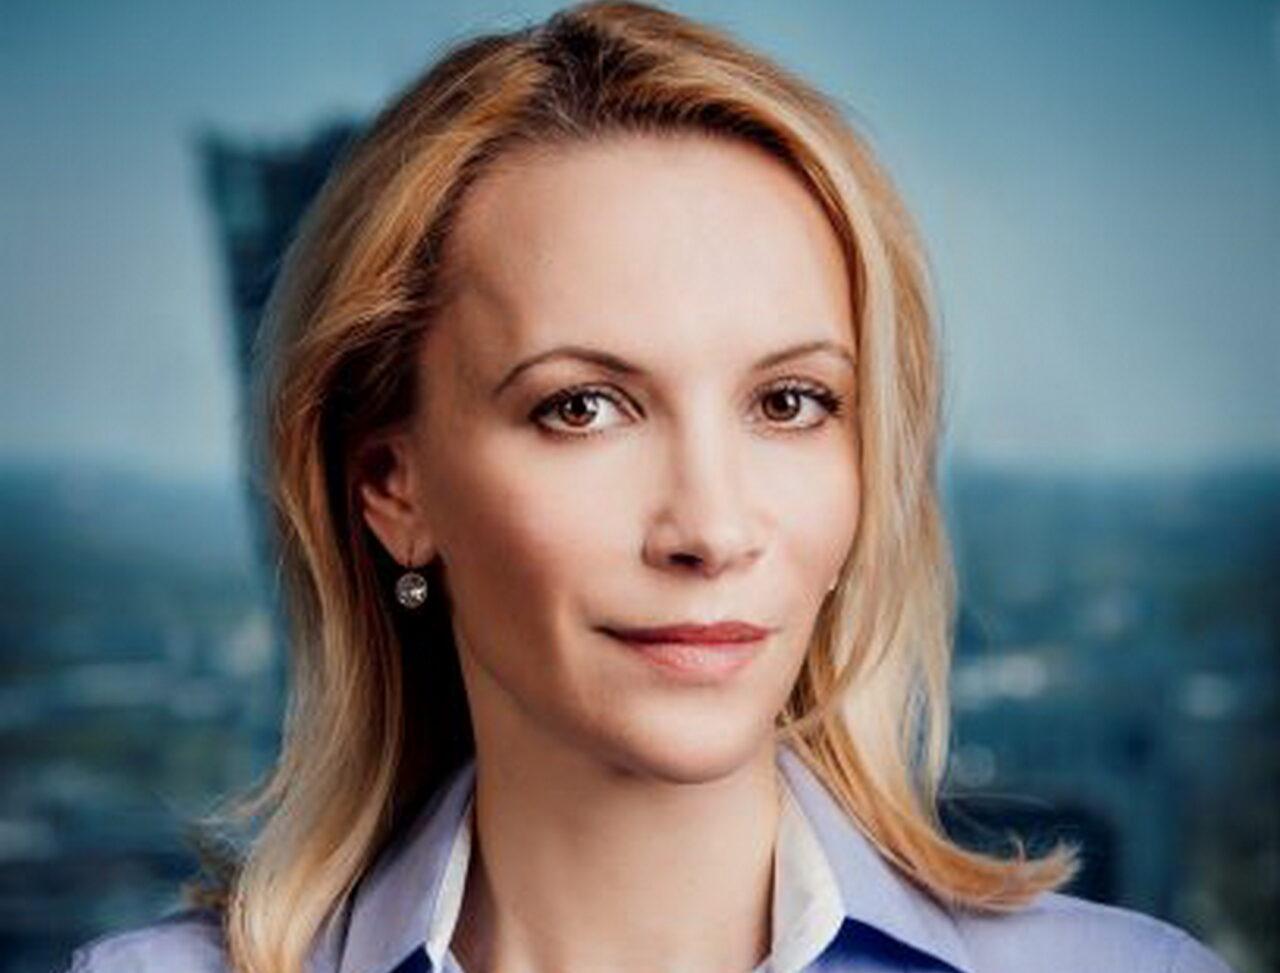 https://intelligent-investors.de/wp-content/uploads/2020/09/Anna-Duchnowska_2-1280x973.jpg